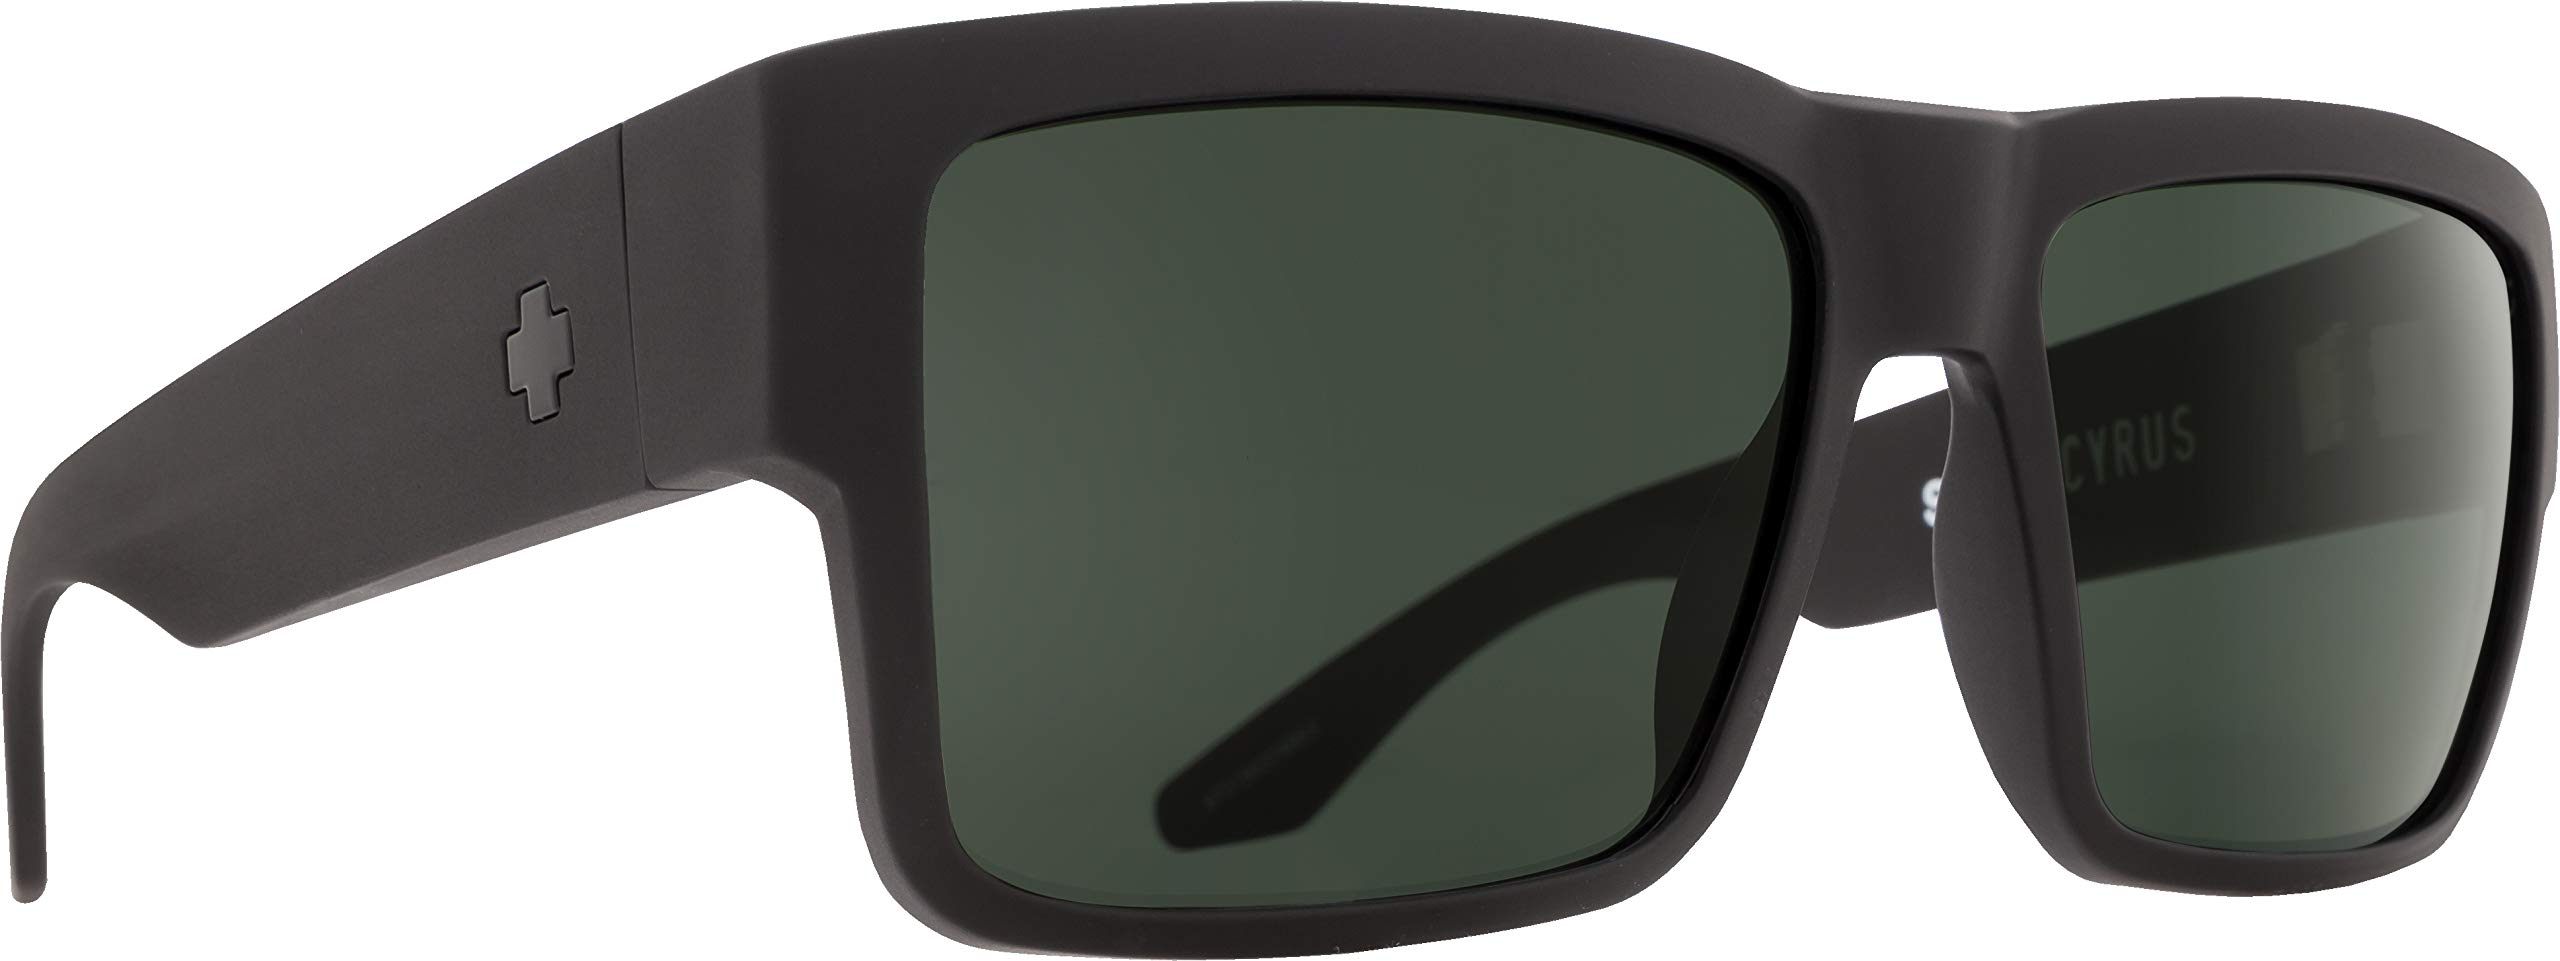 Spy Optic Men Cyrus Rectangular, Matte Black/Happy Gray/Green, 58 mm